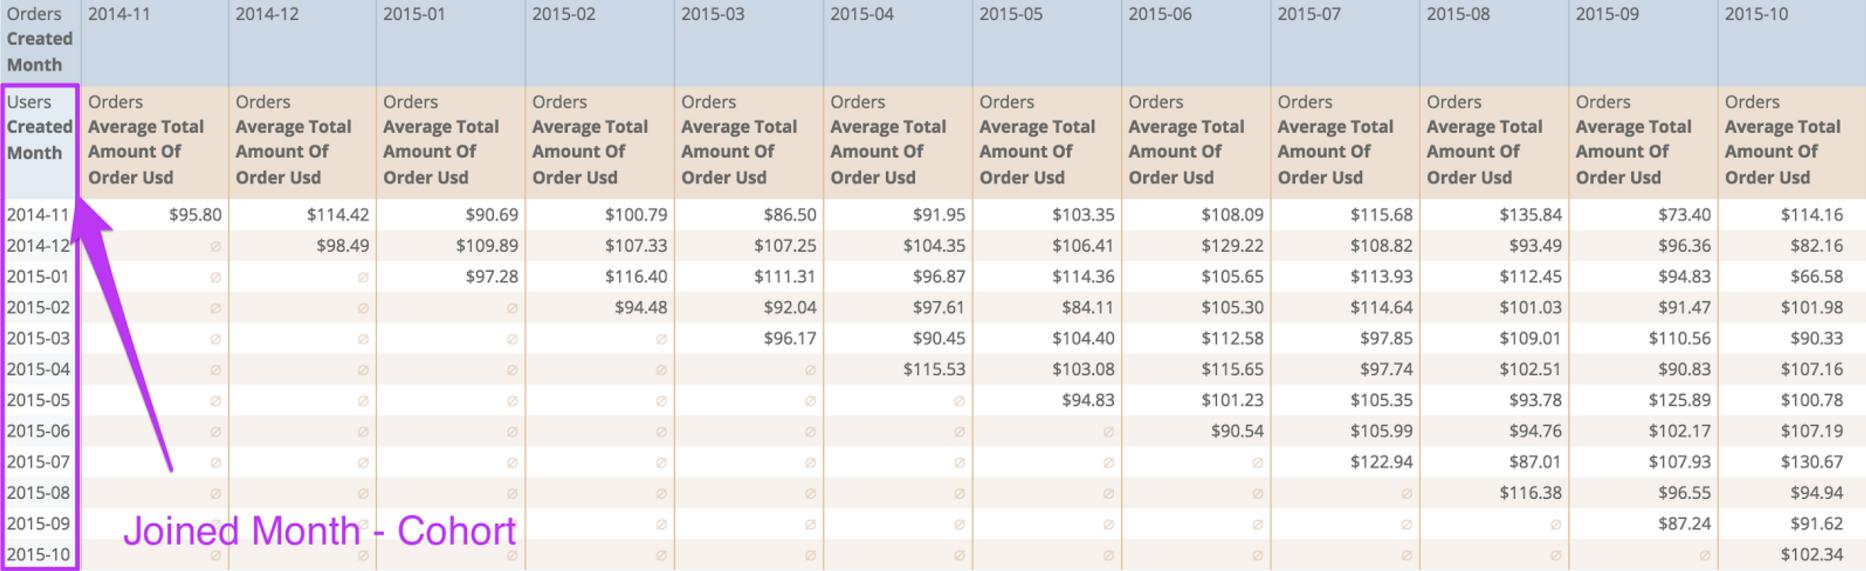 User Average Order Value